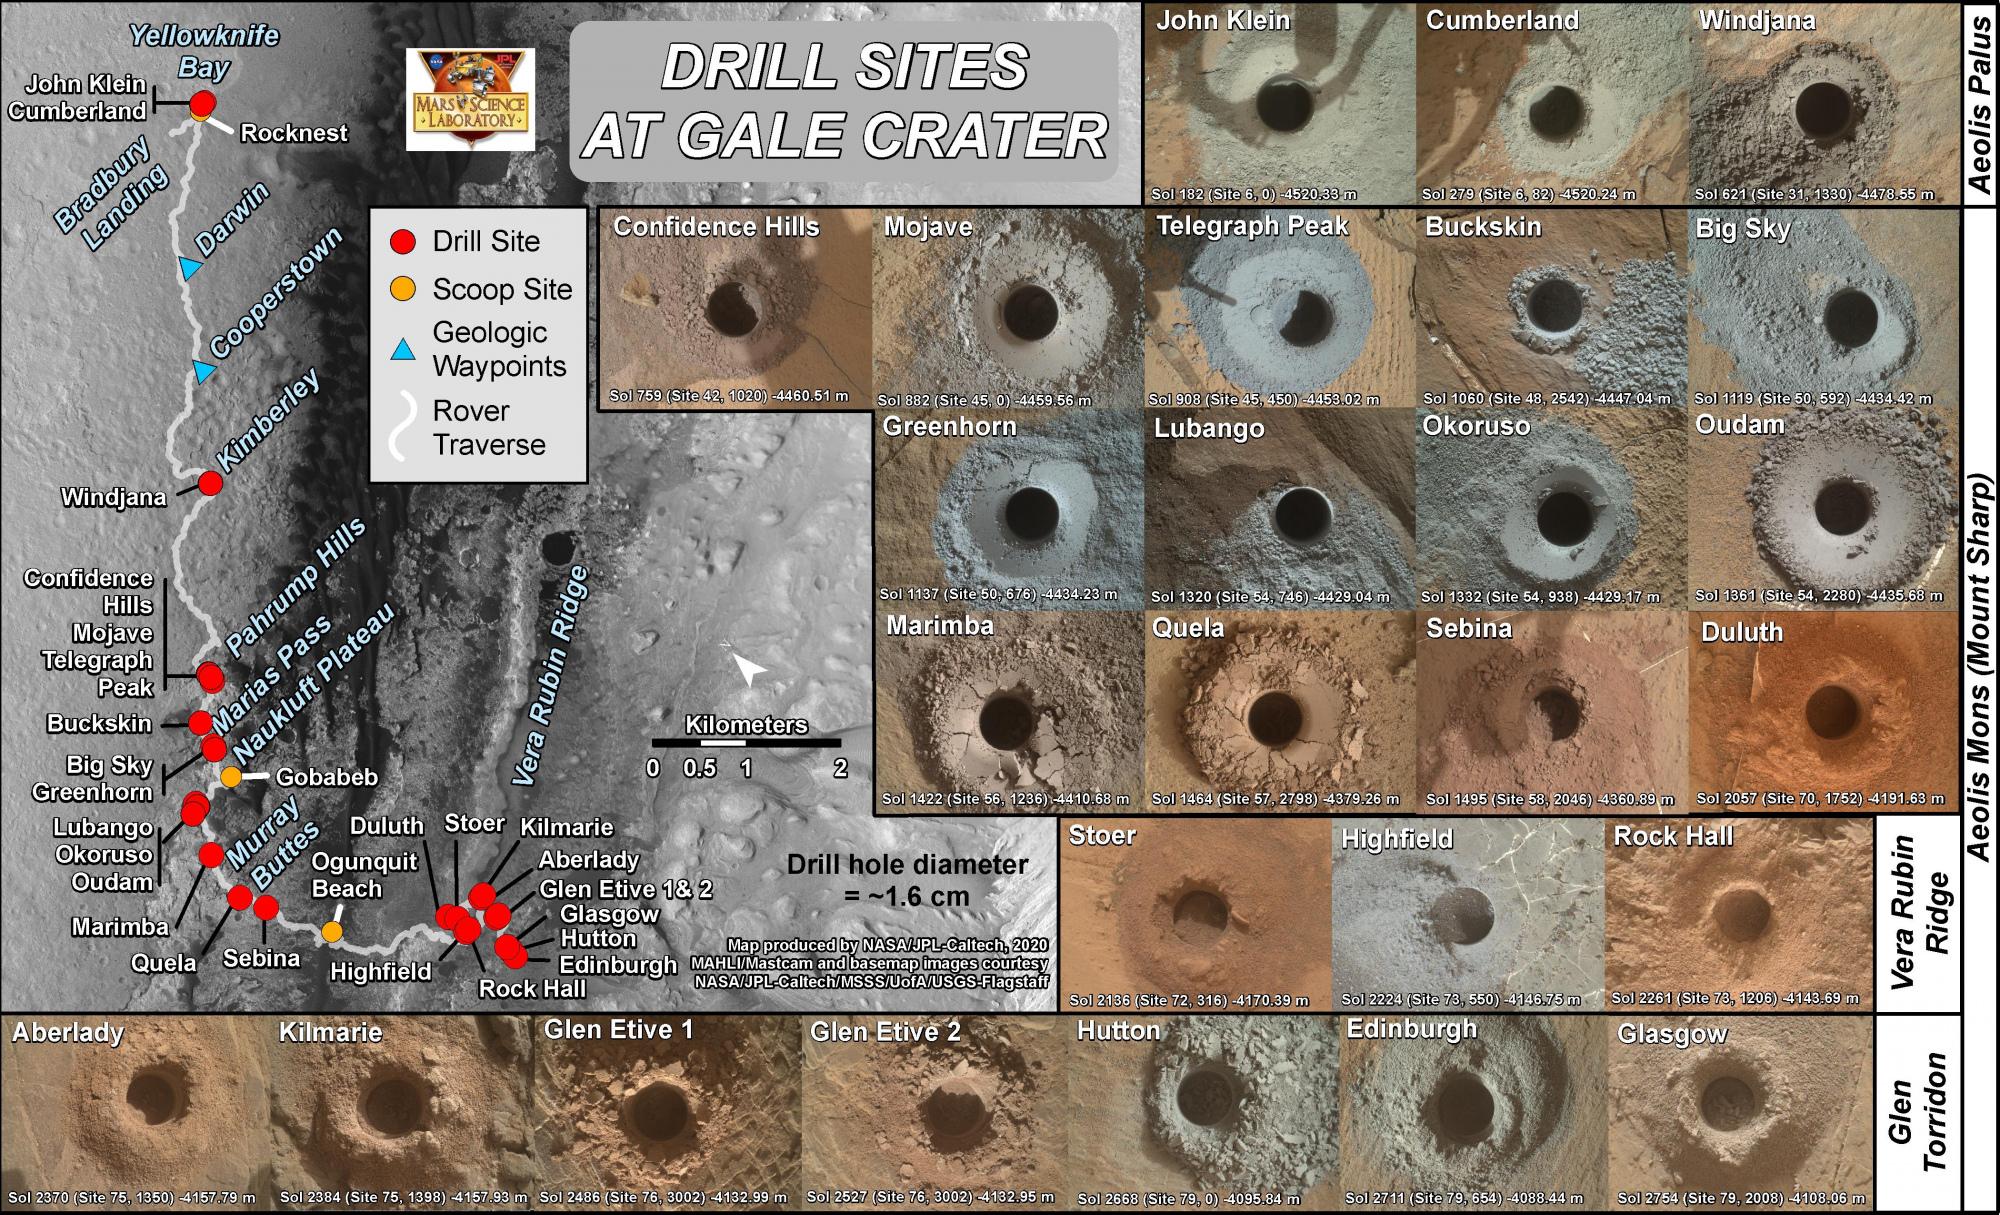 drill_holes.thumb.jpg.3ea8ebc8deff8c638fa604bcc1859d40.jpg